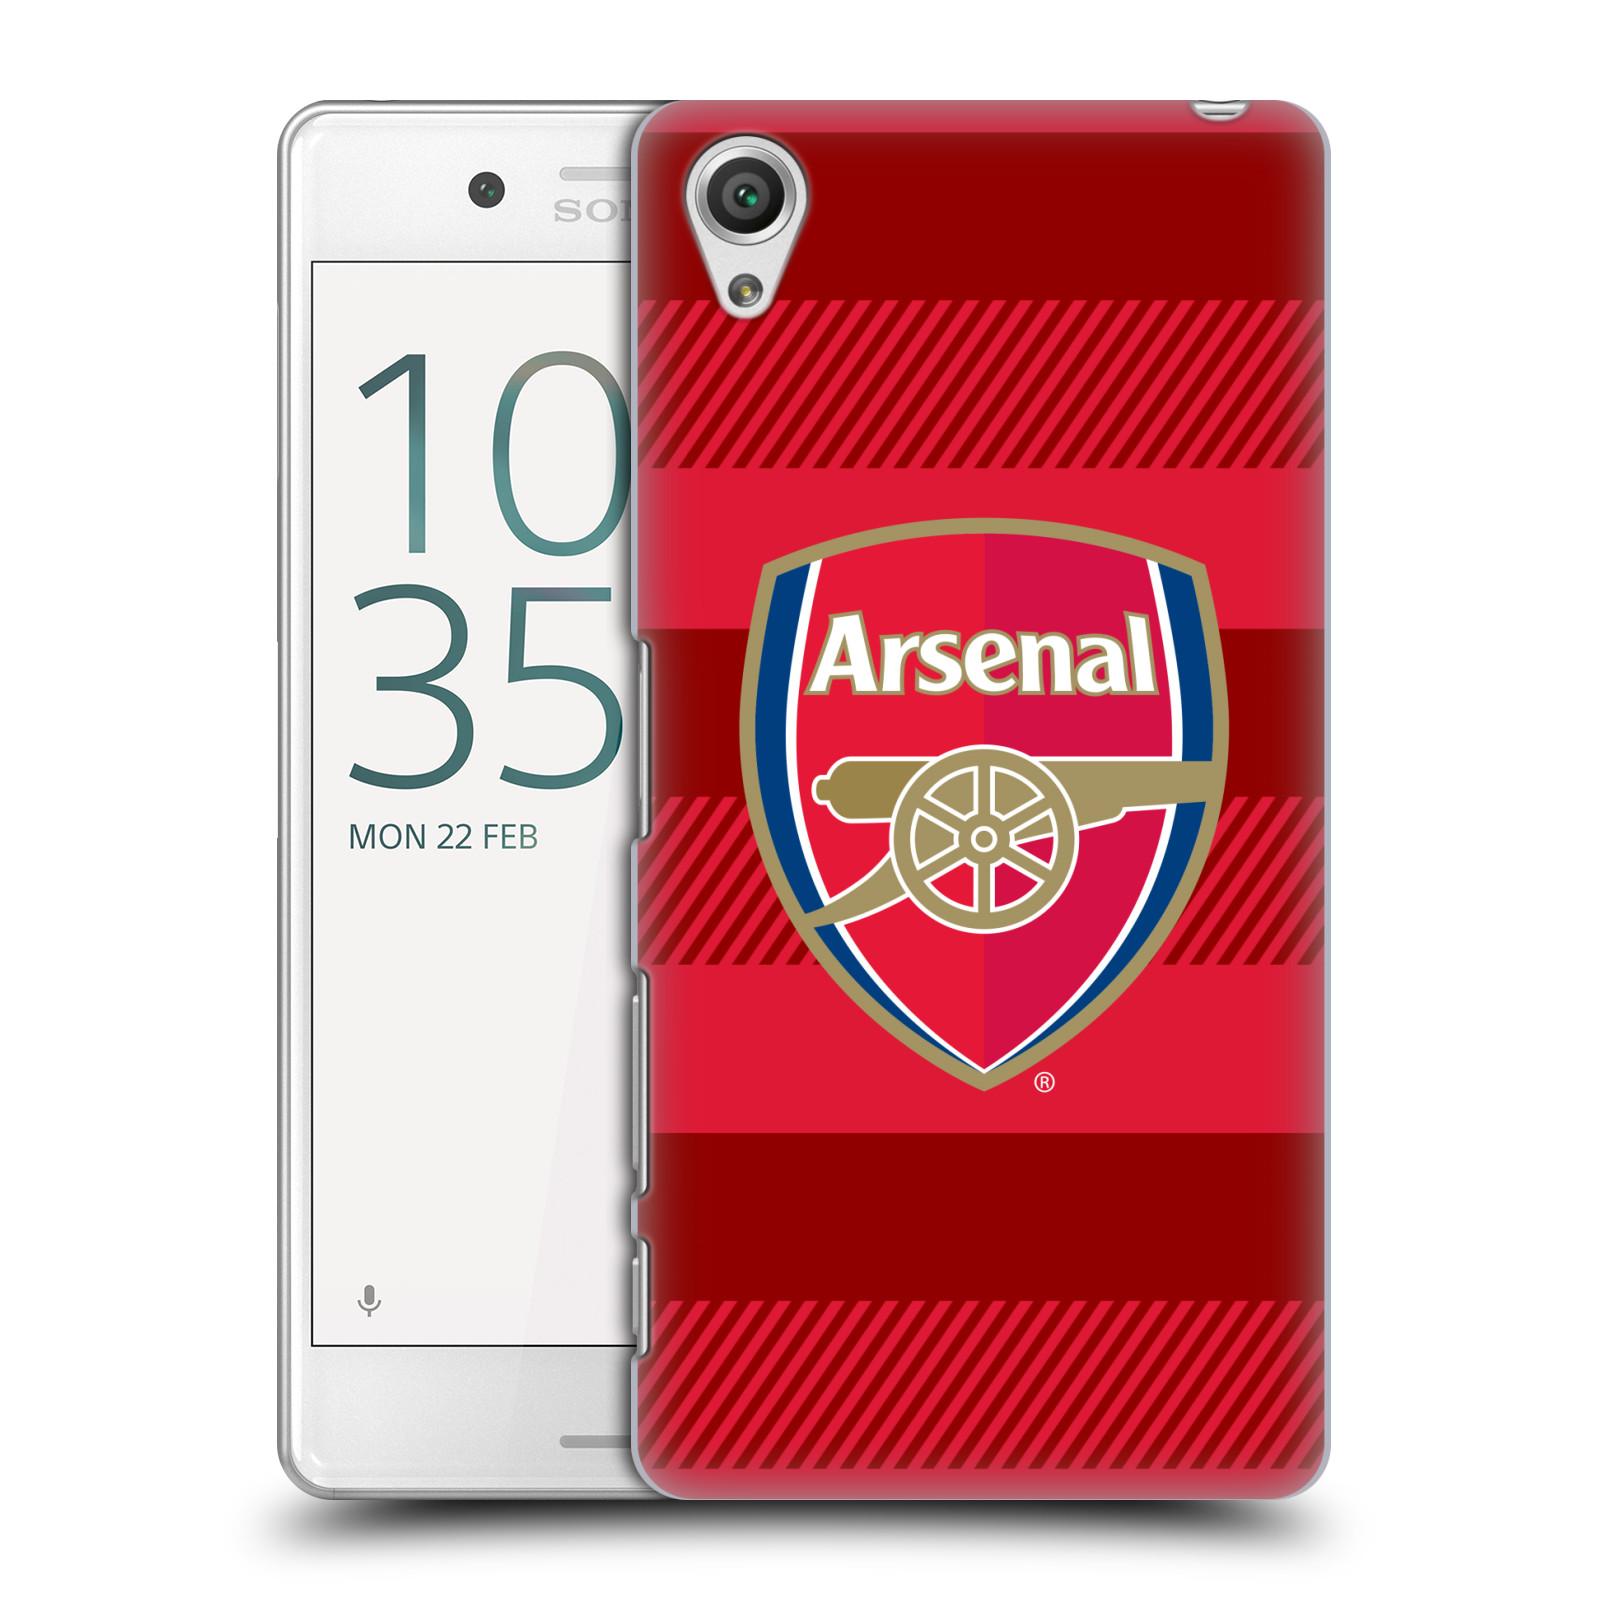 Plastové pouzdro na mobil Sony Xperia X Performance - Head Case - Arsenal FC - Logo s pruhy